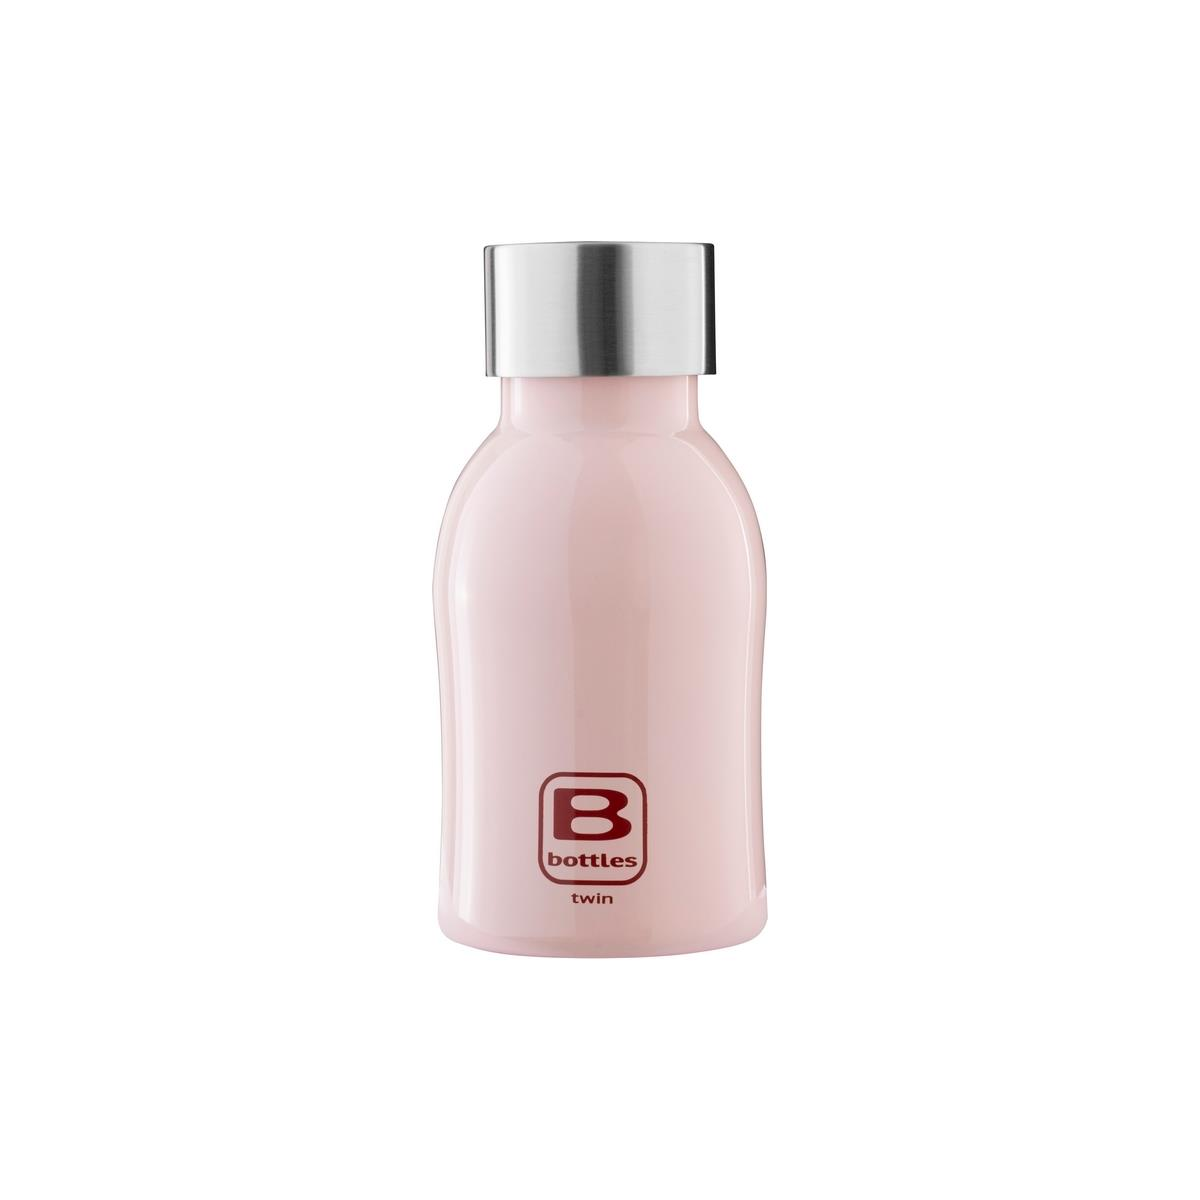 B Bottles Twin - Pink - 250 ml - Bottiglia Termica a doppia parete in acciaio inox 18/10